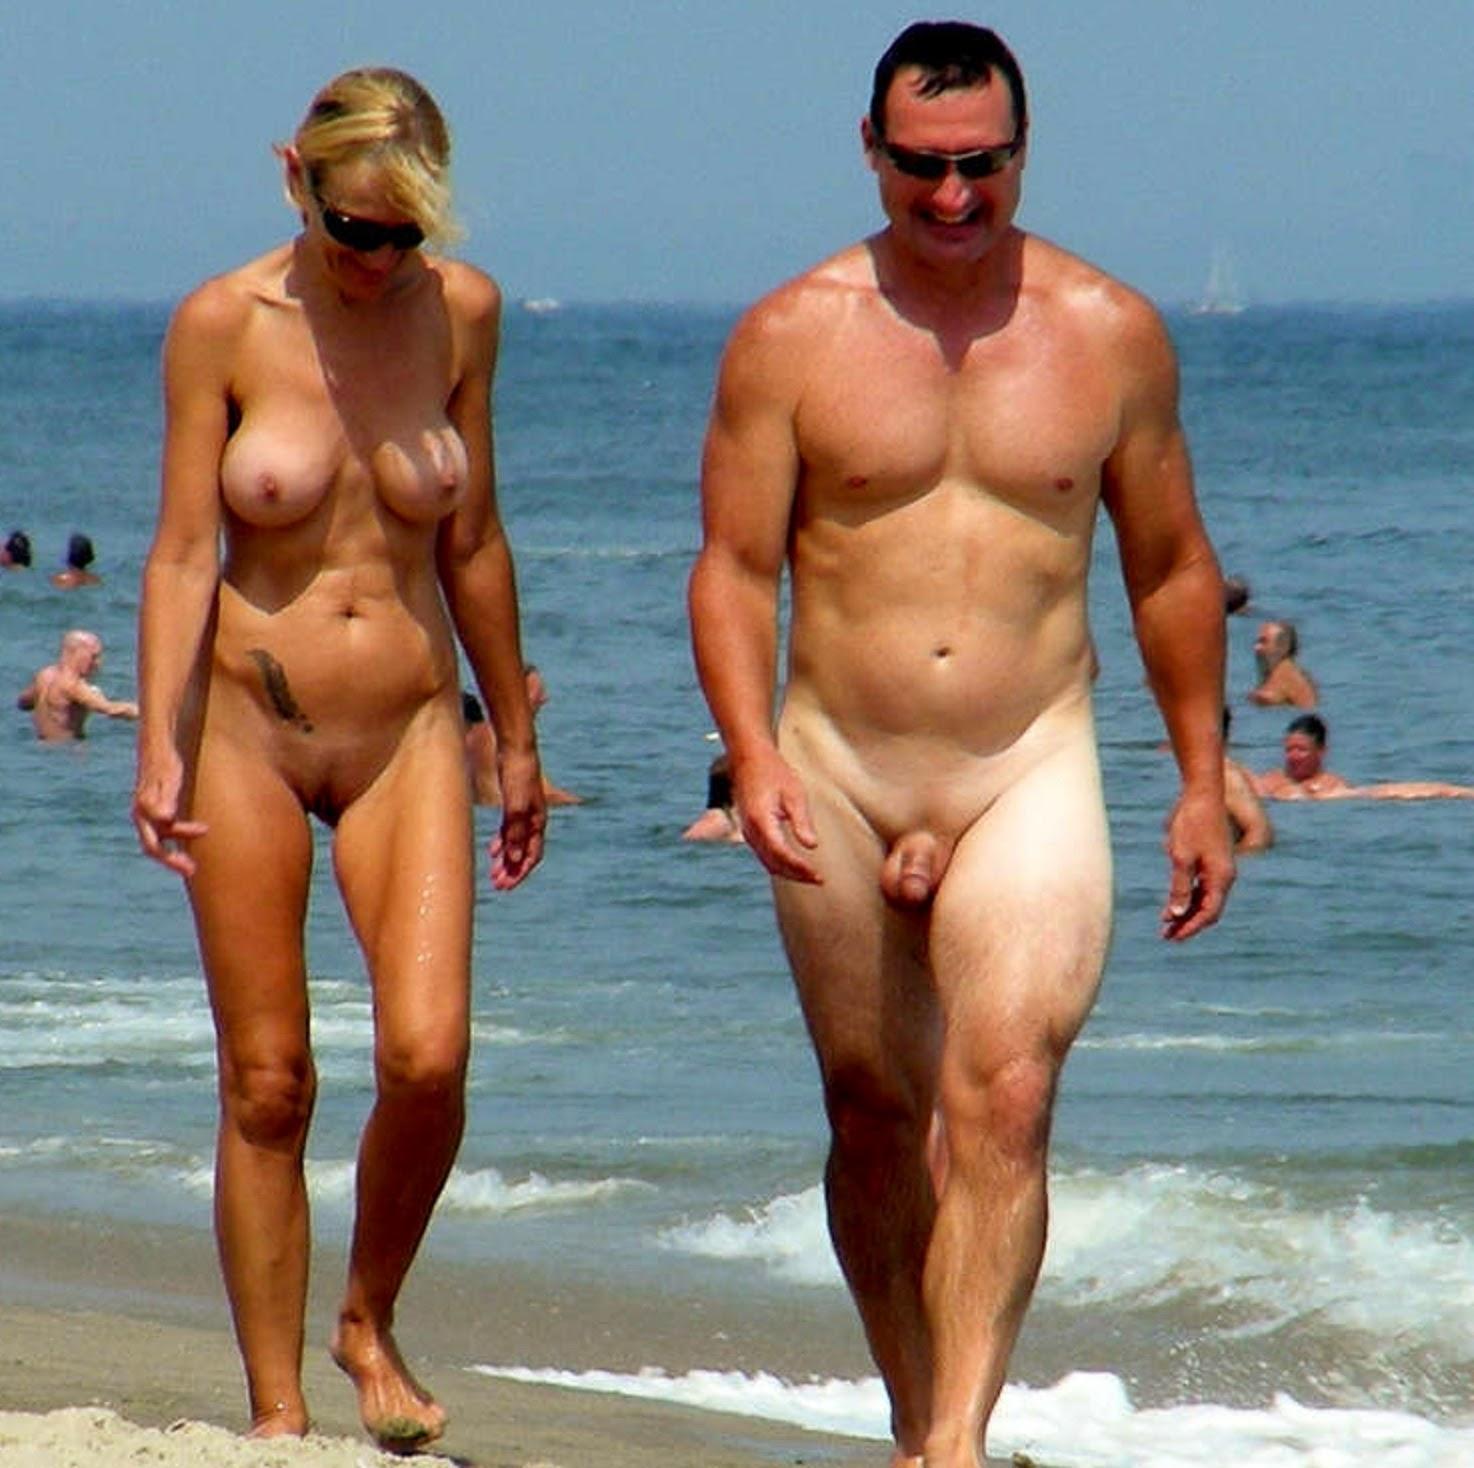 Nudist beach in new jersey